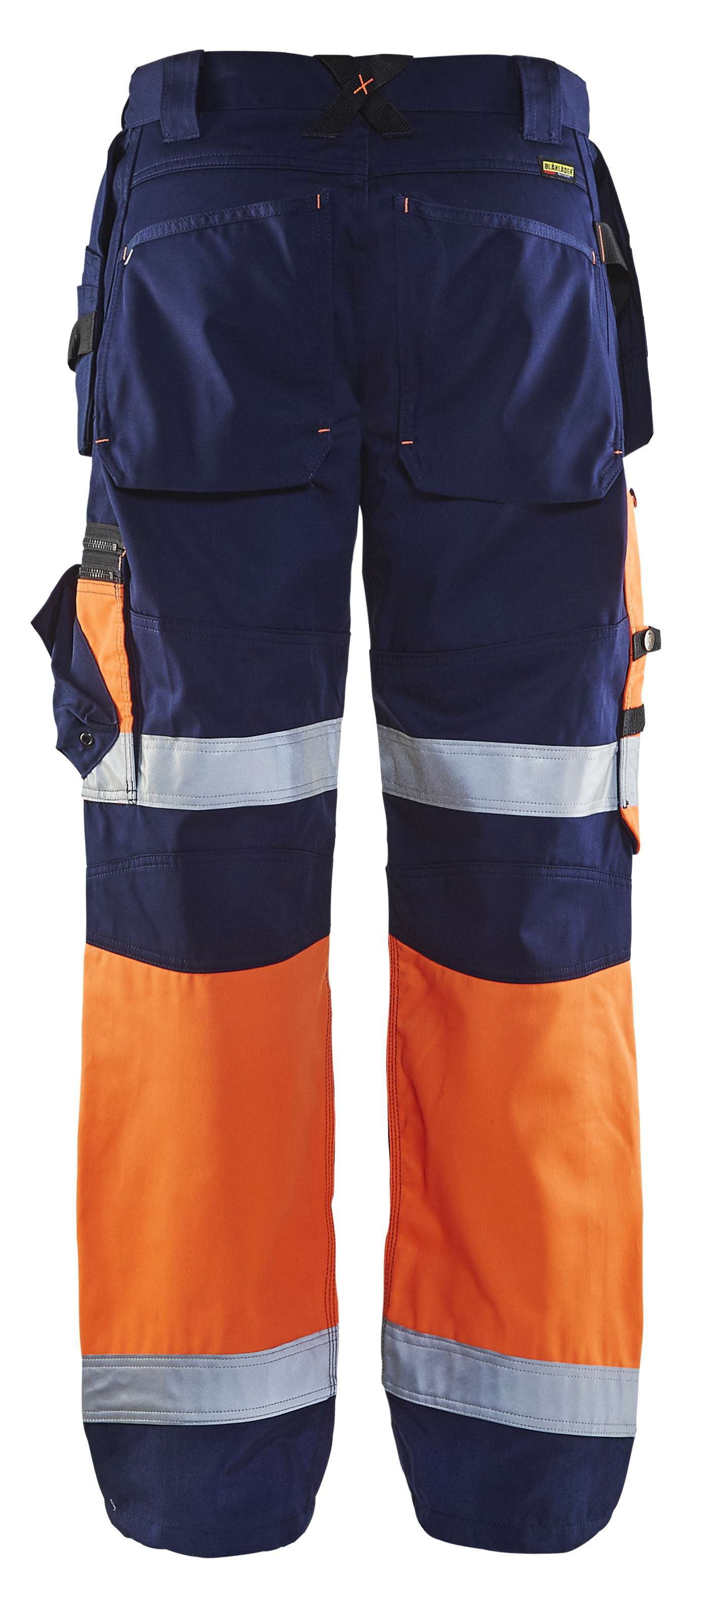 Blaklader Broeken 15081860 High Vis marineblauw-oranje(8953)